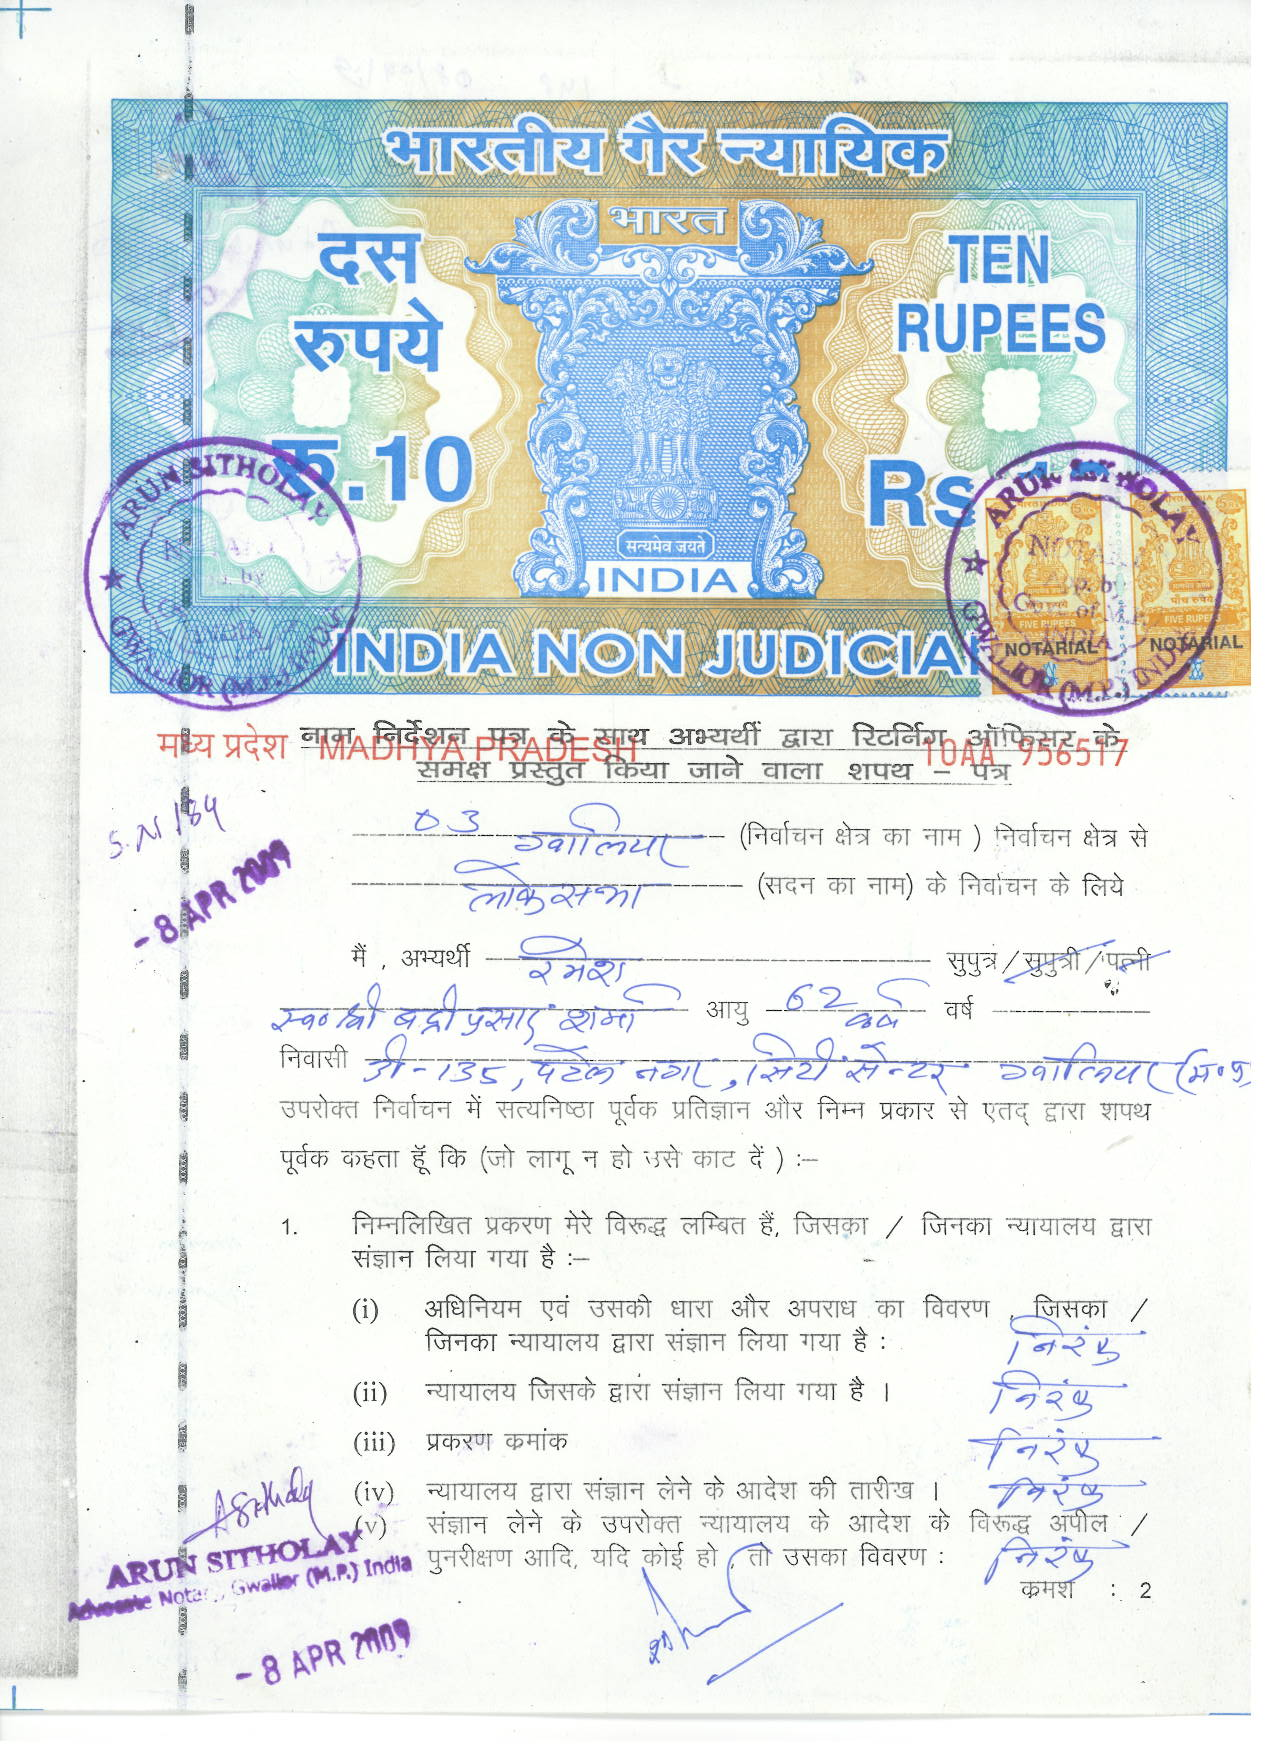 Ramesh Chandra Sharma Ijp Constituency Gwalior Madhya Pradesh